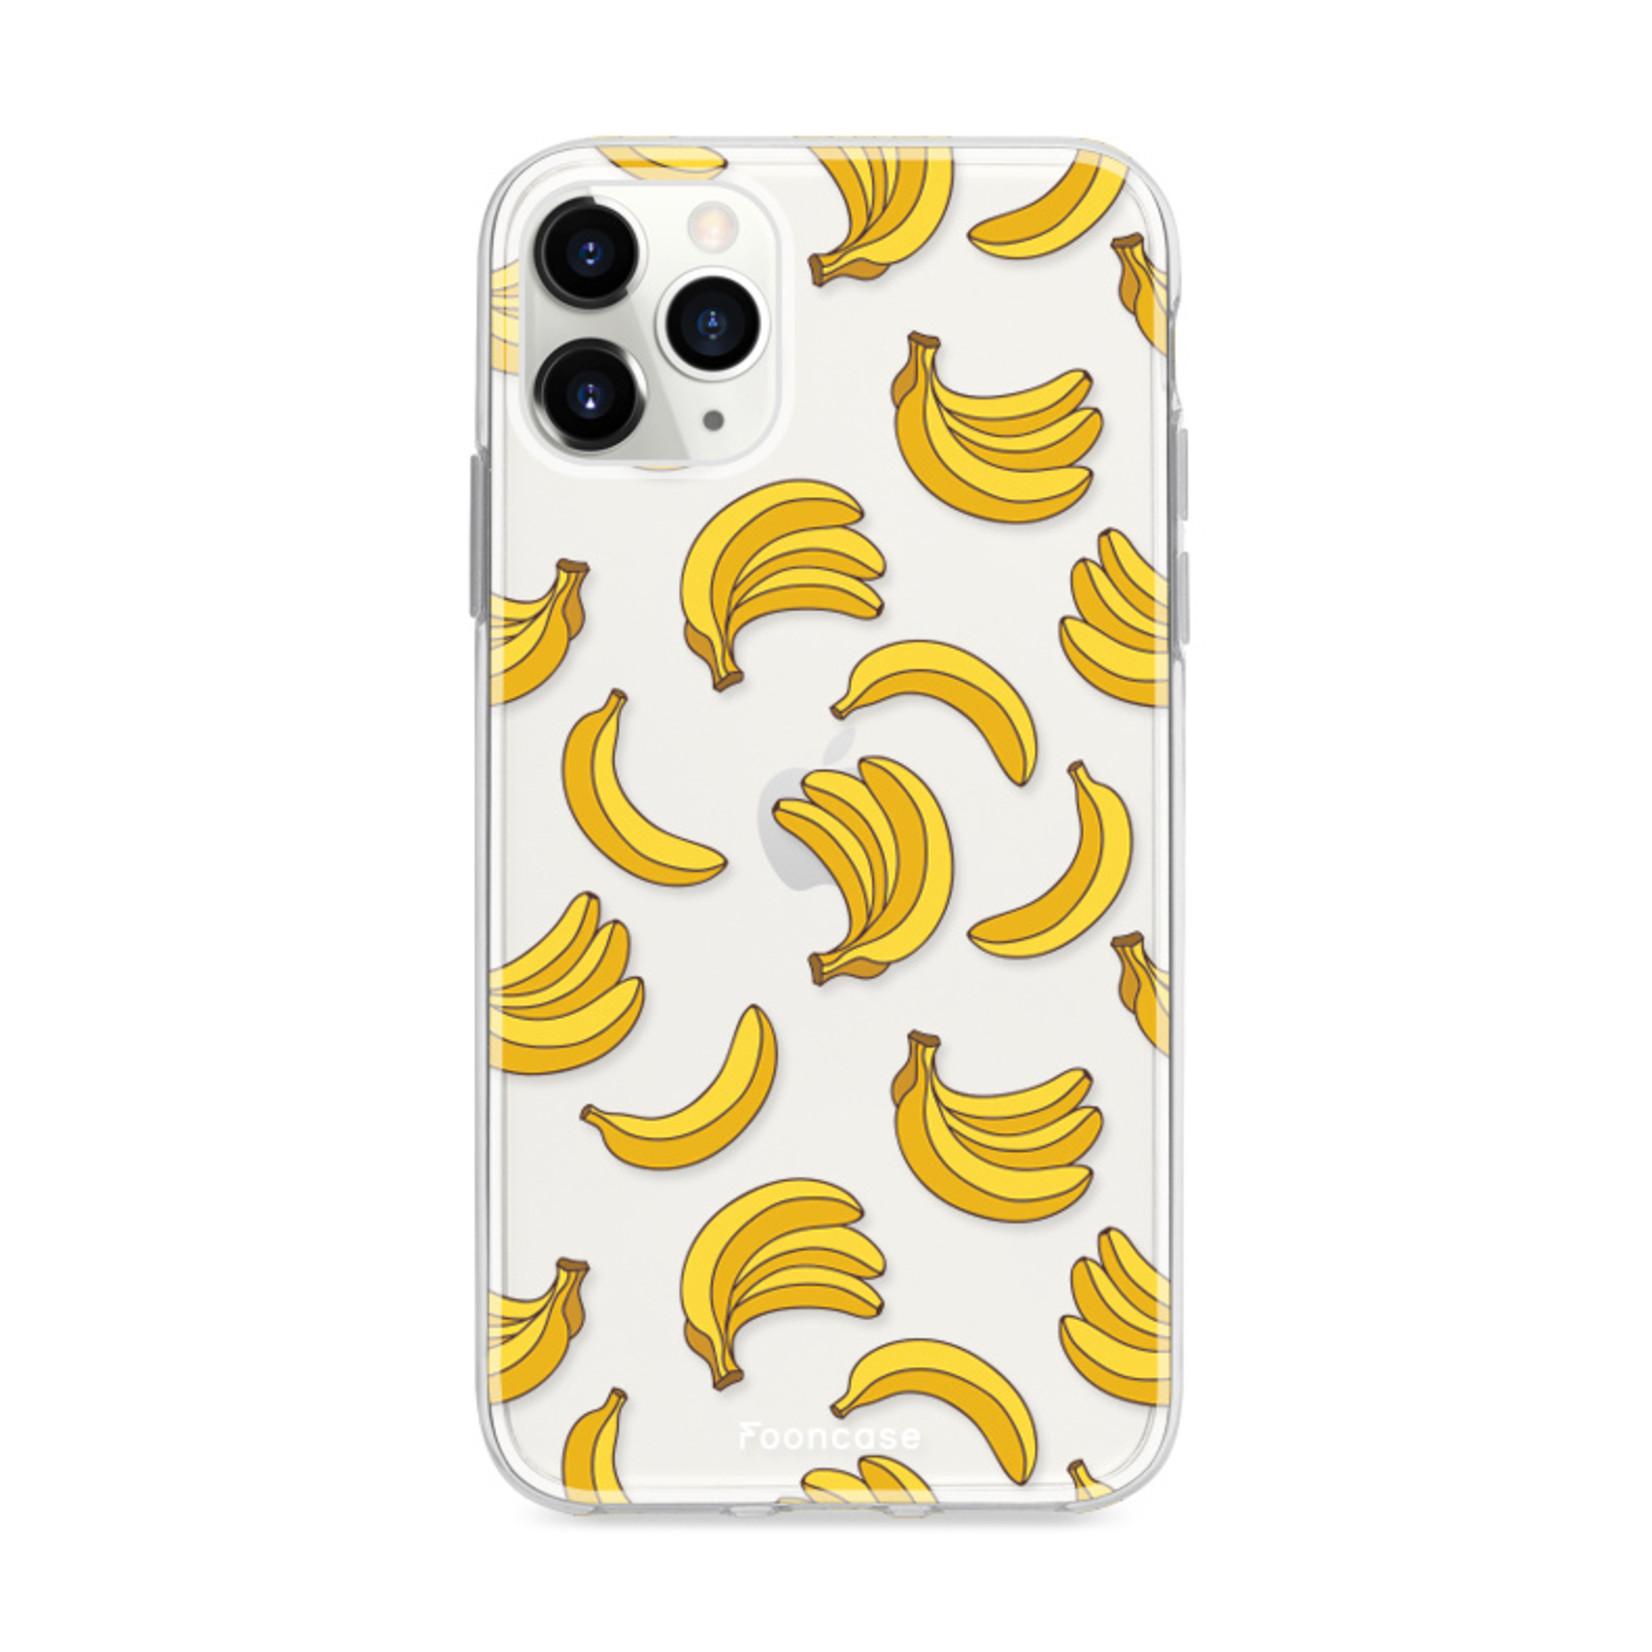 FOONCASE IPhone 12 Pro Max Case - Bananas